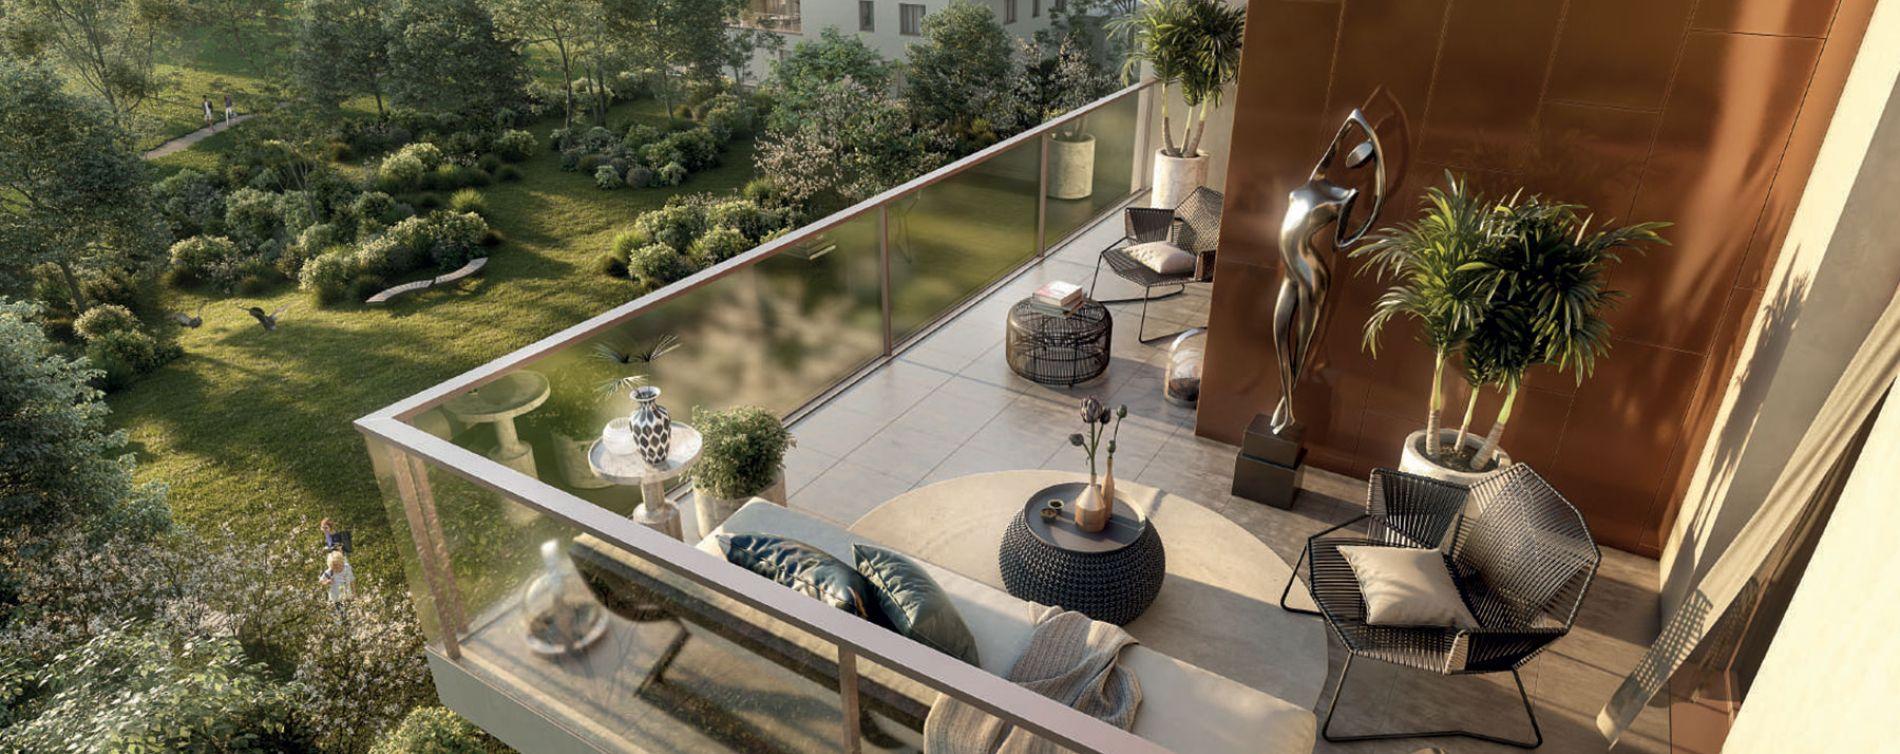 Lingolsheim : programme immobilier neuve « Green Square - Tranche 2 » (2)